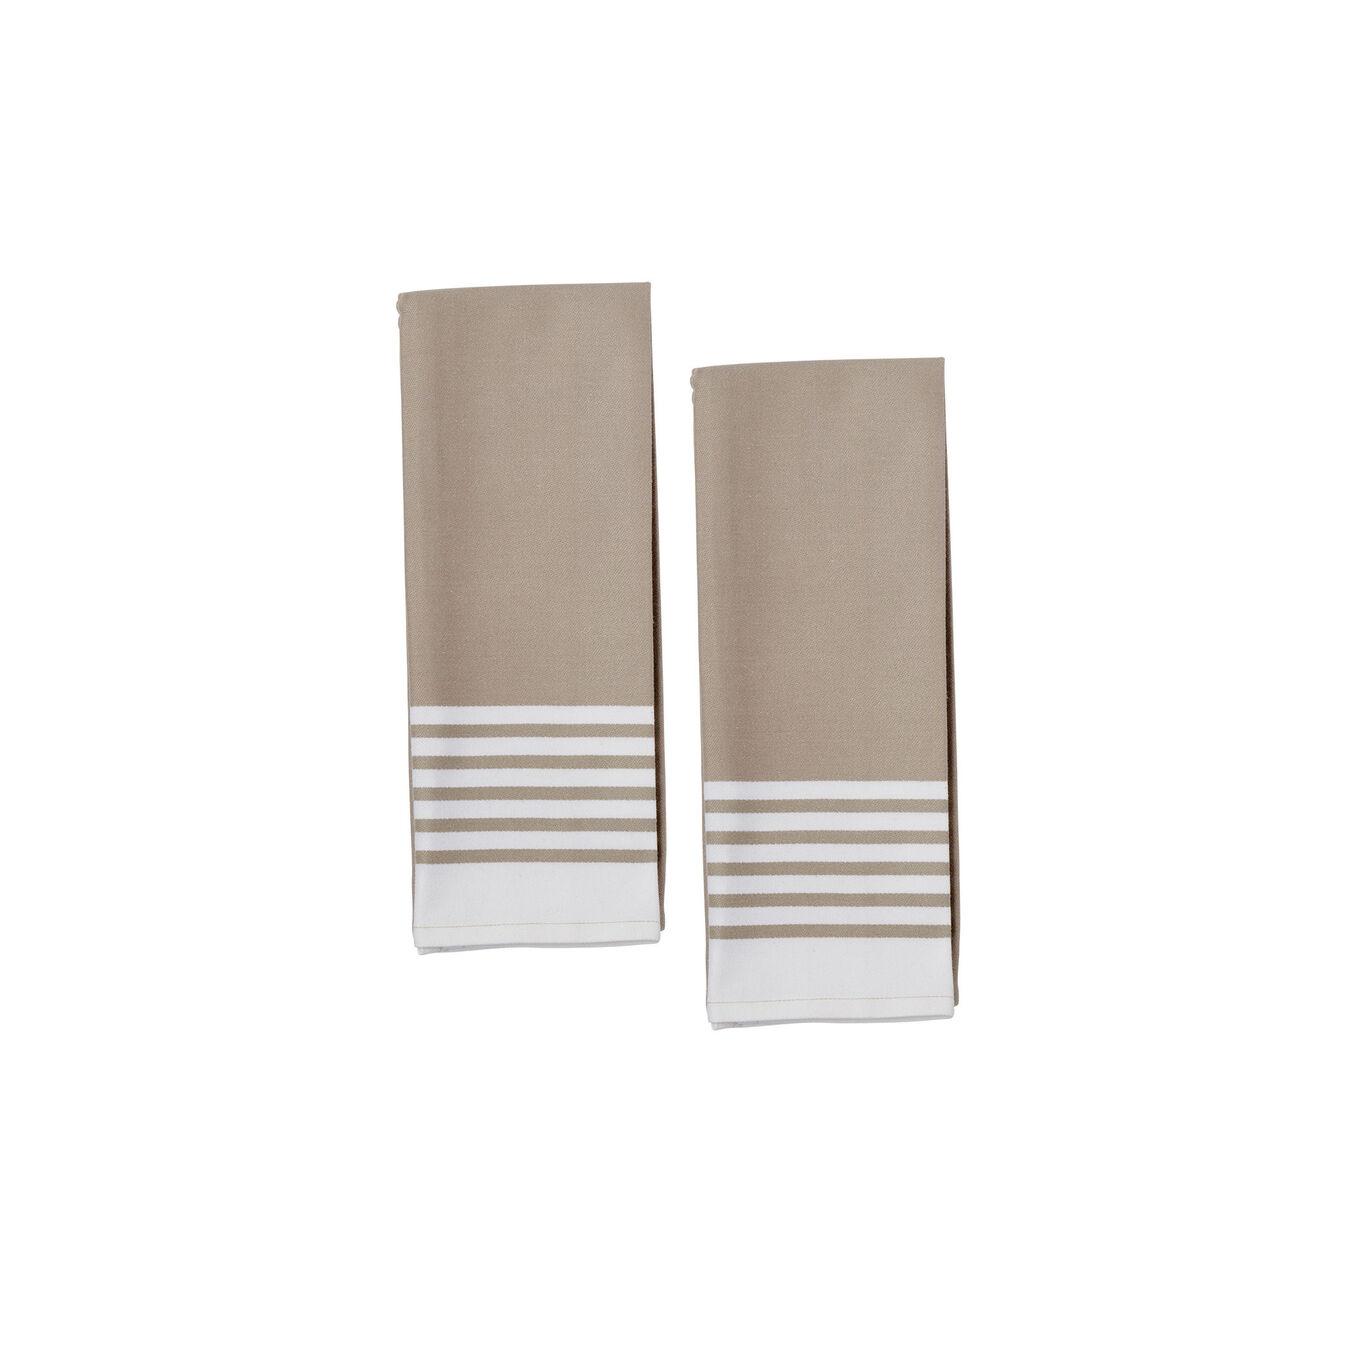 4-pc Kitchen Towel Set - Taupe,,large 2